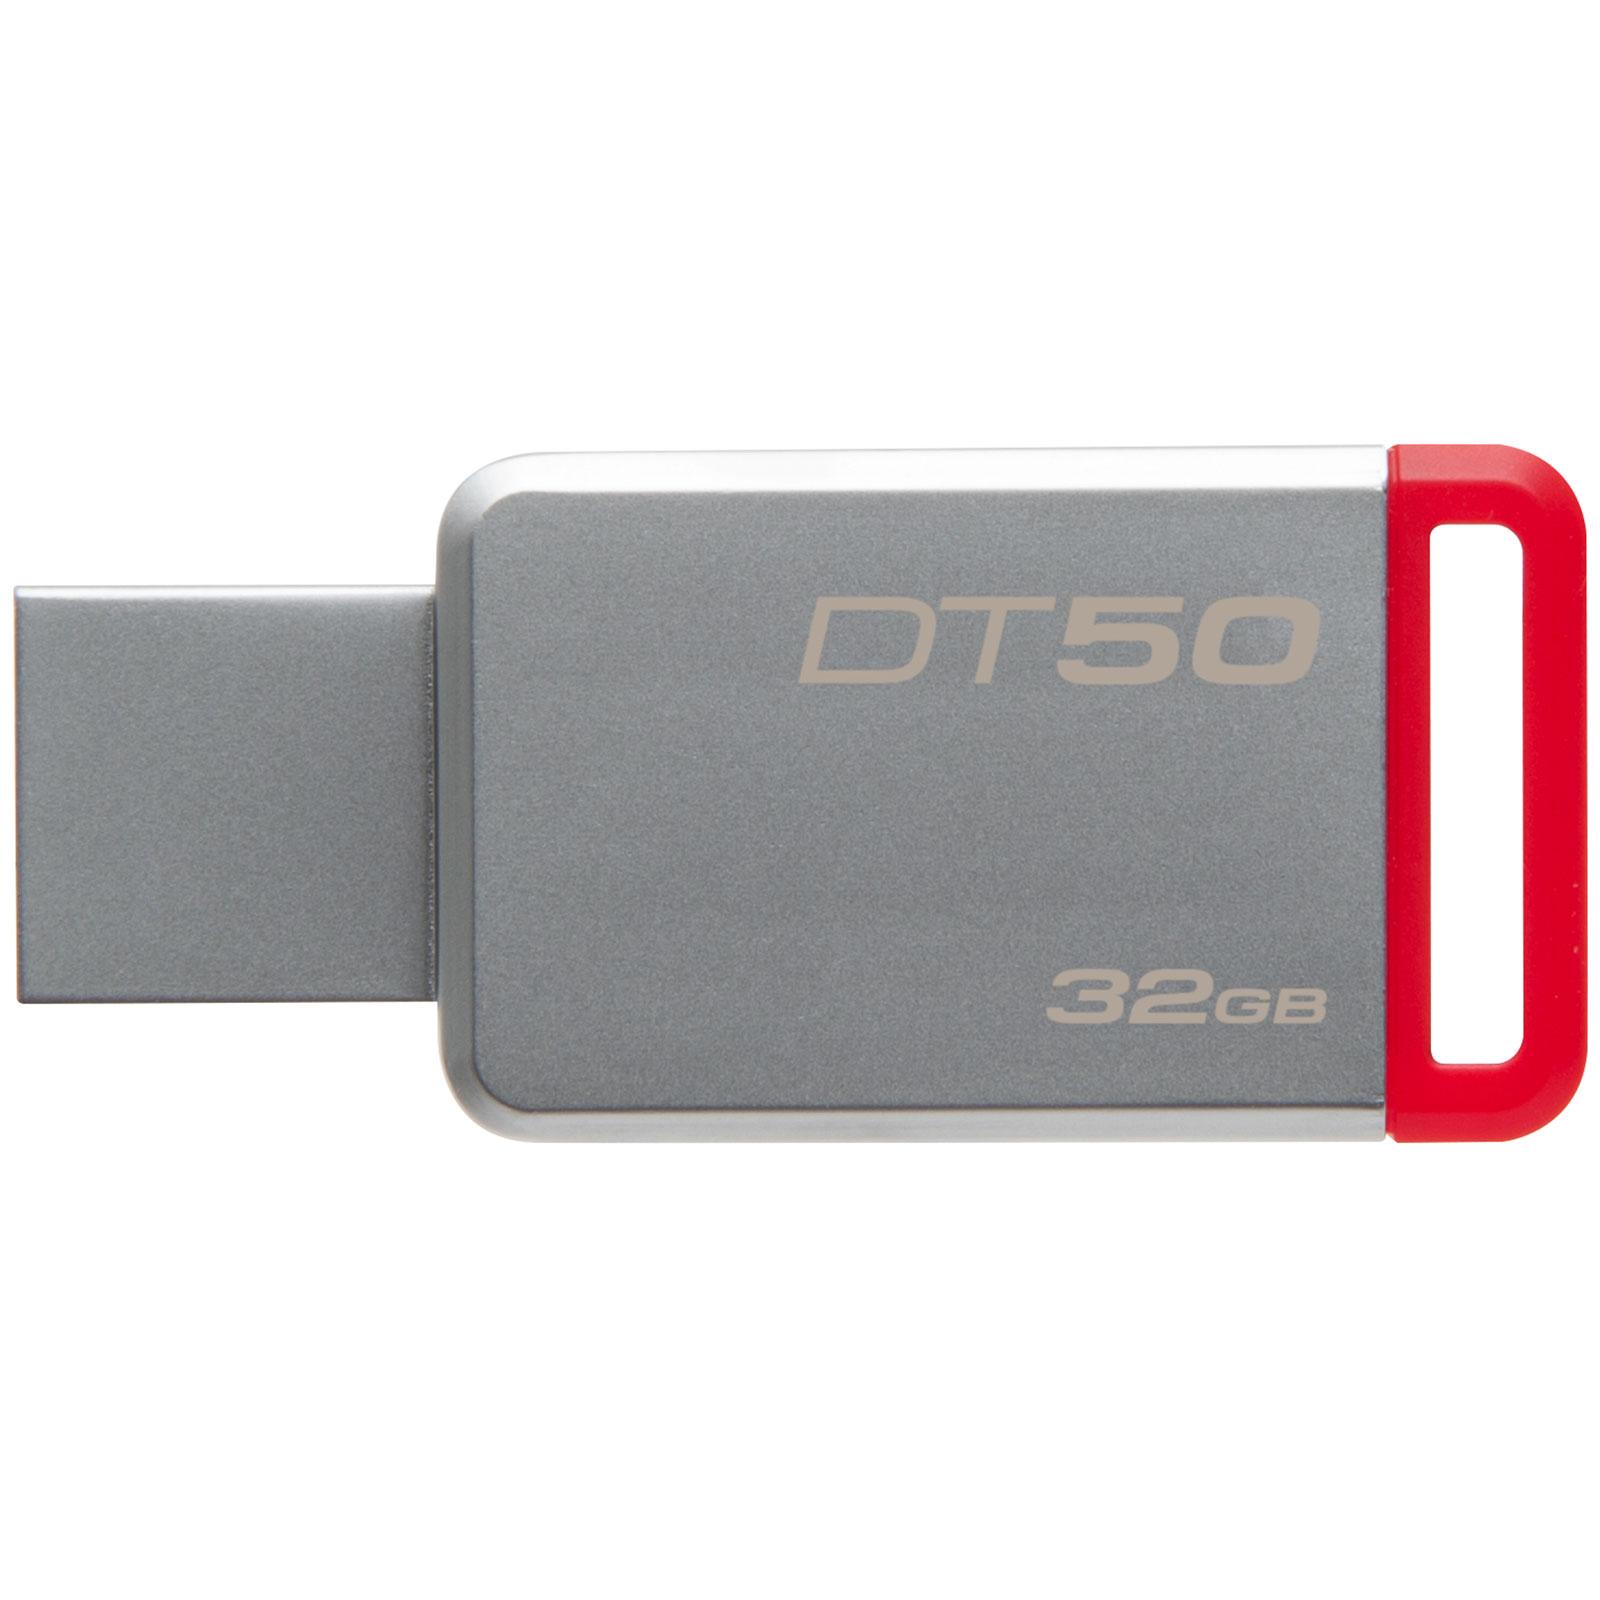 Kingston DataTraveler 50 32Go USB 3.1 (DT50/32GB) - Achat / Vente Clé USB sur Cybertek.fr - 1